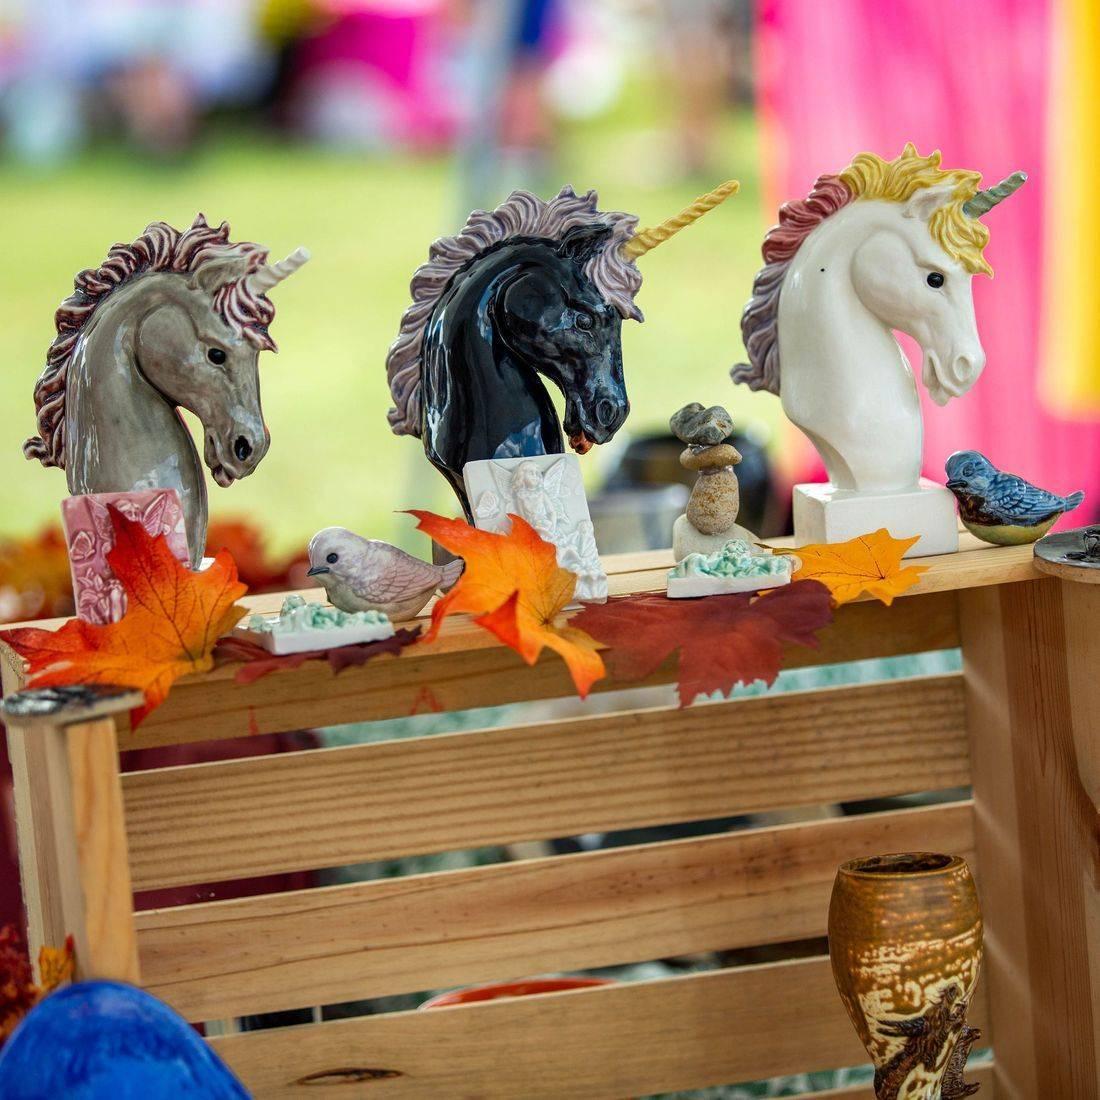 horse, horse sculpture, unicorn, unicorn sculpture